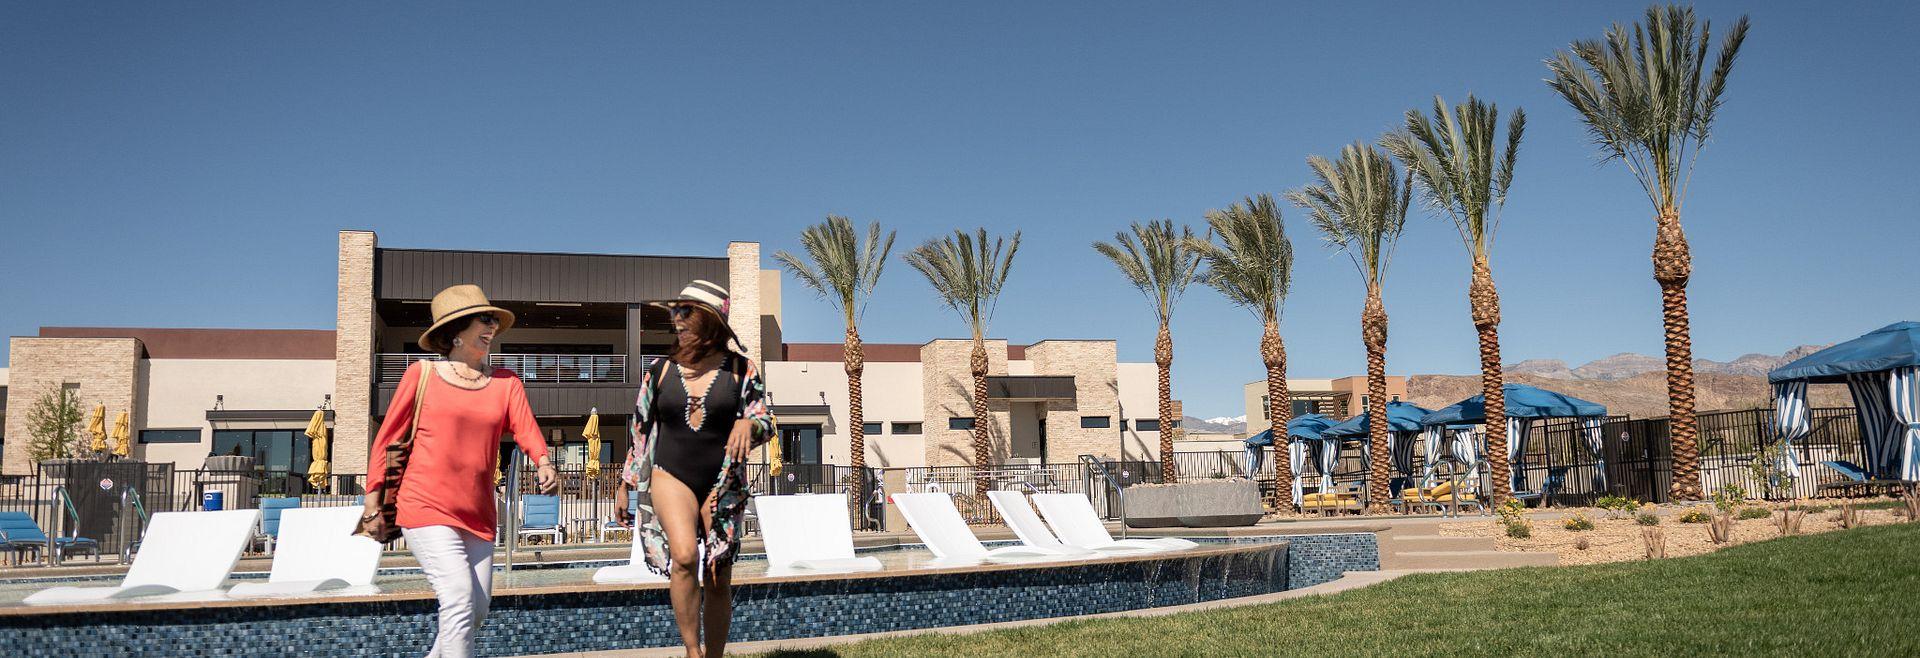 Trilogy Summerlin Homeowners Enjoying The Pool